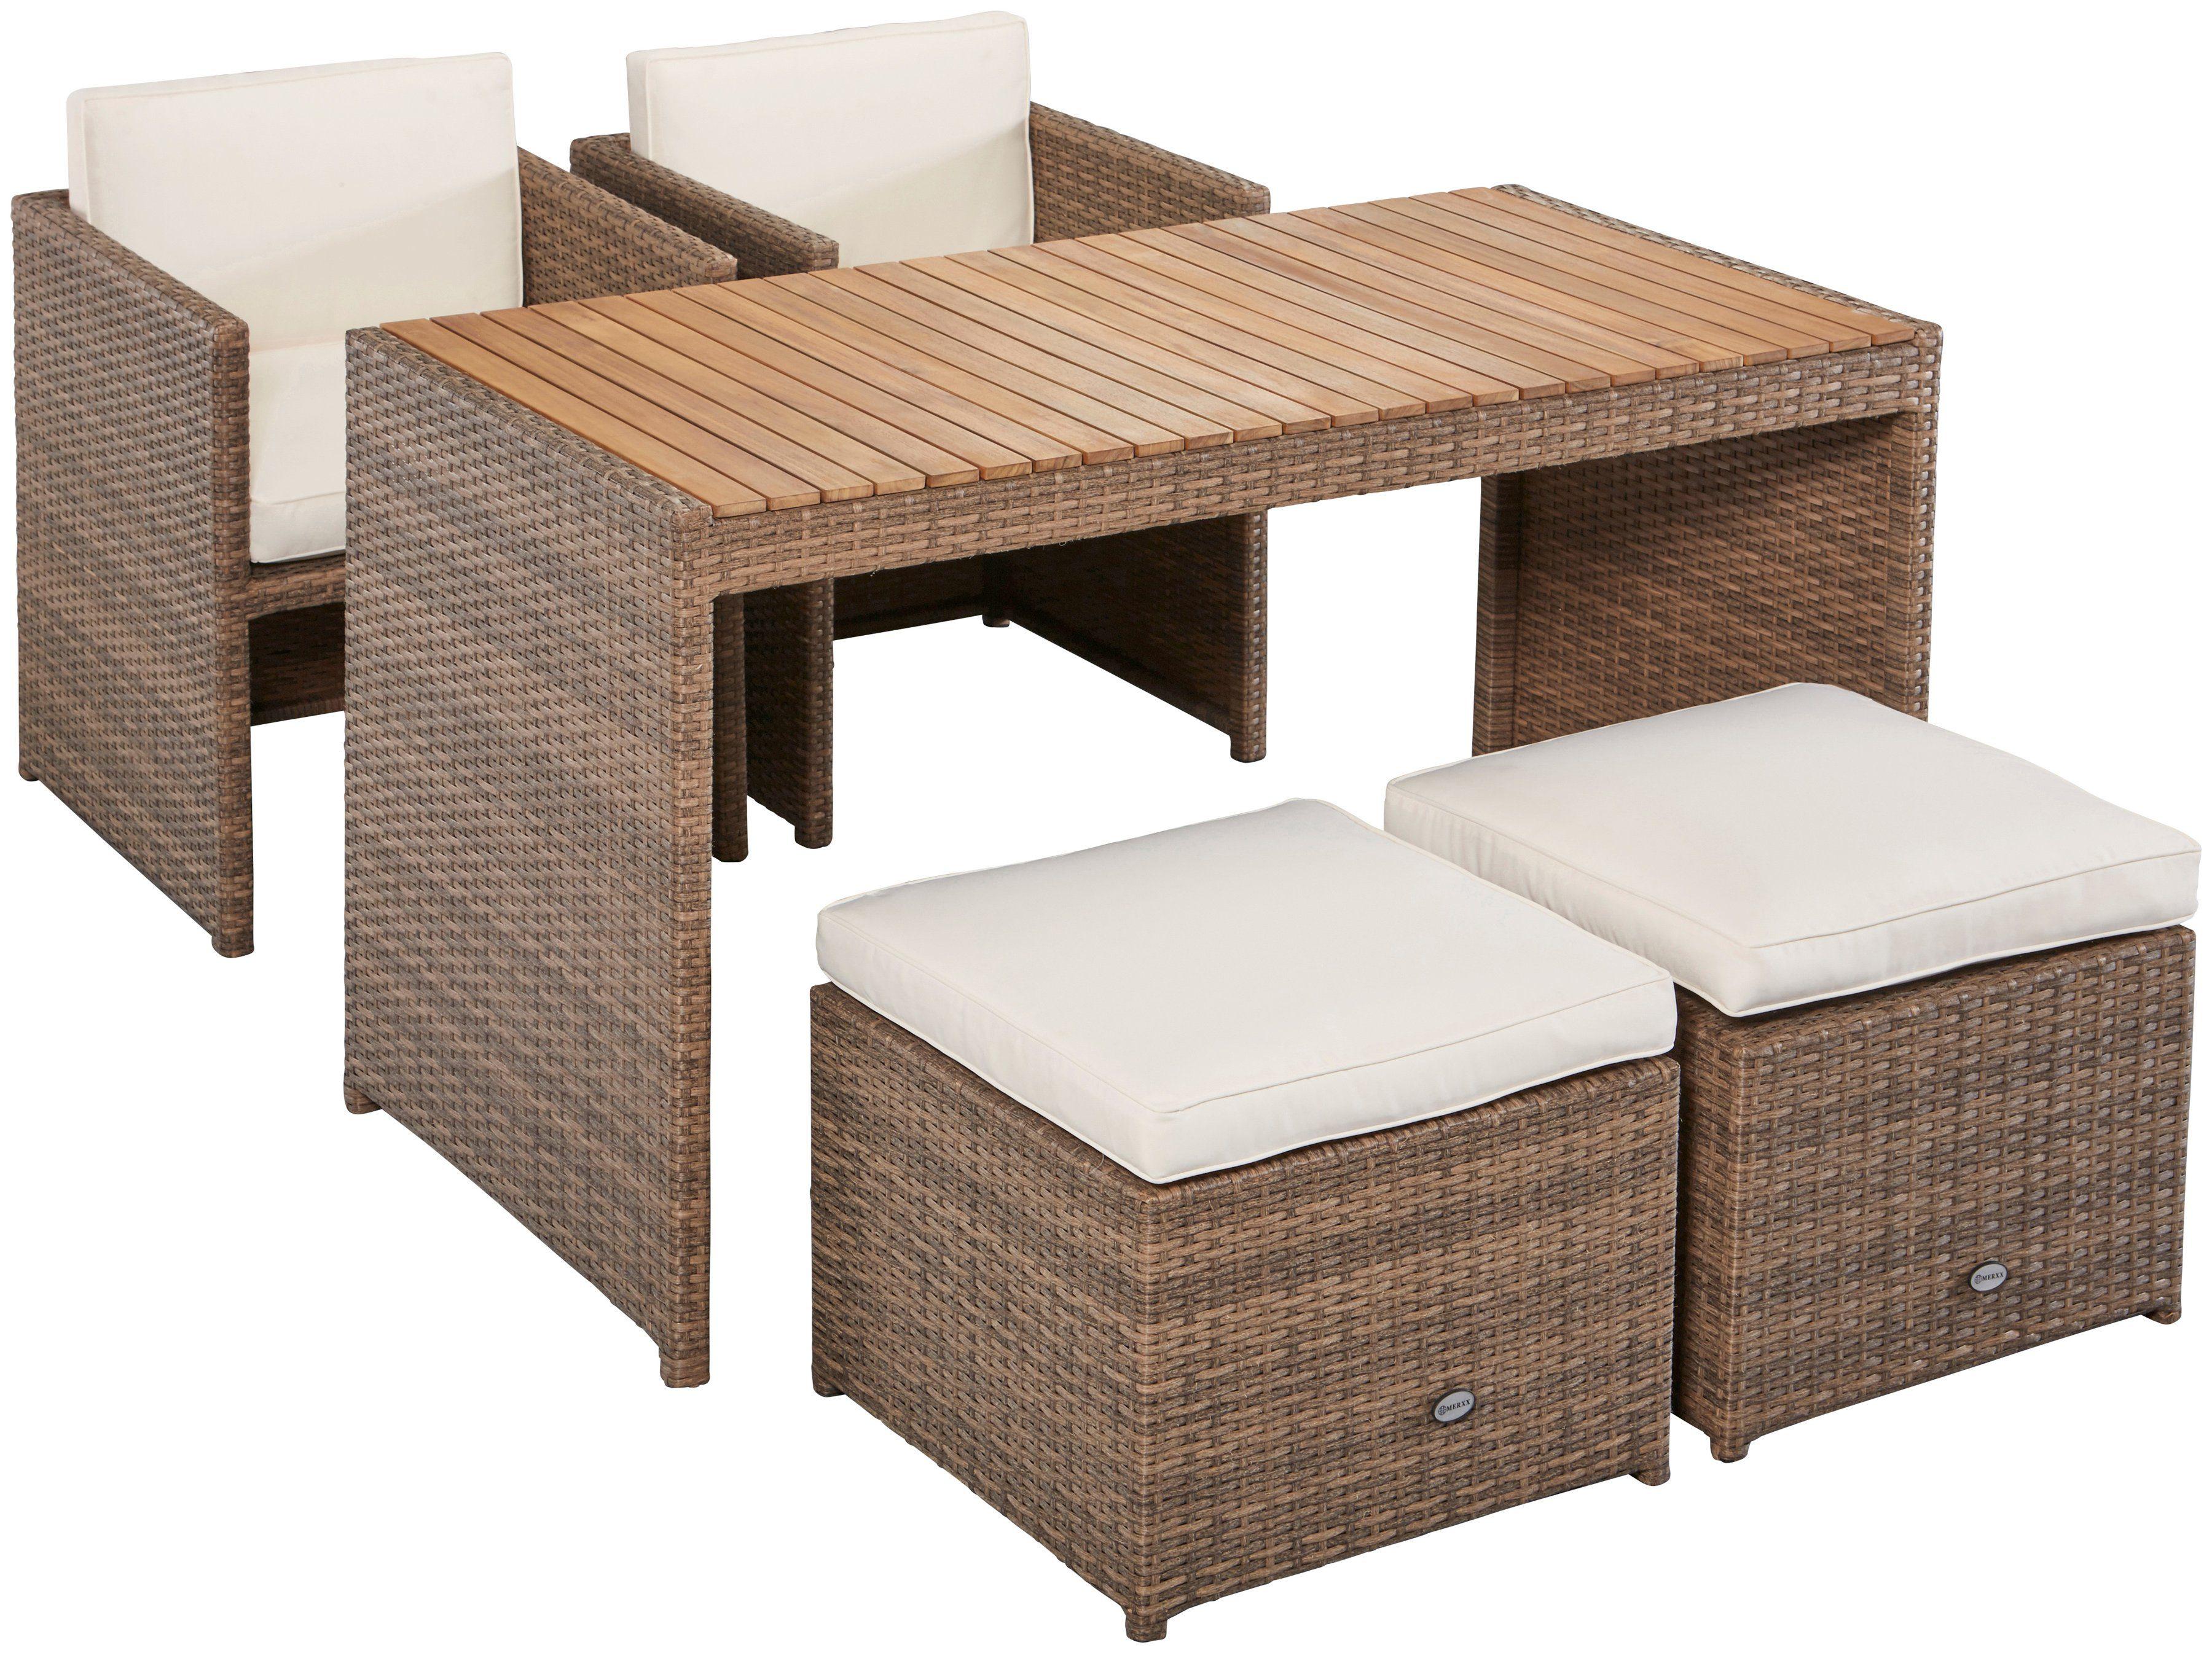 Balkon hangtafel blokker fabulous balkon hangtafel blokker with